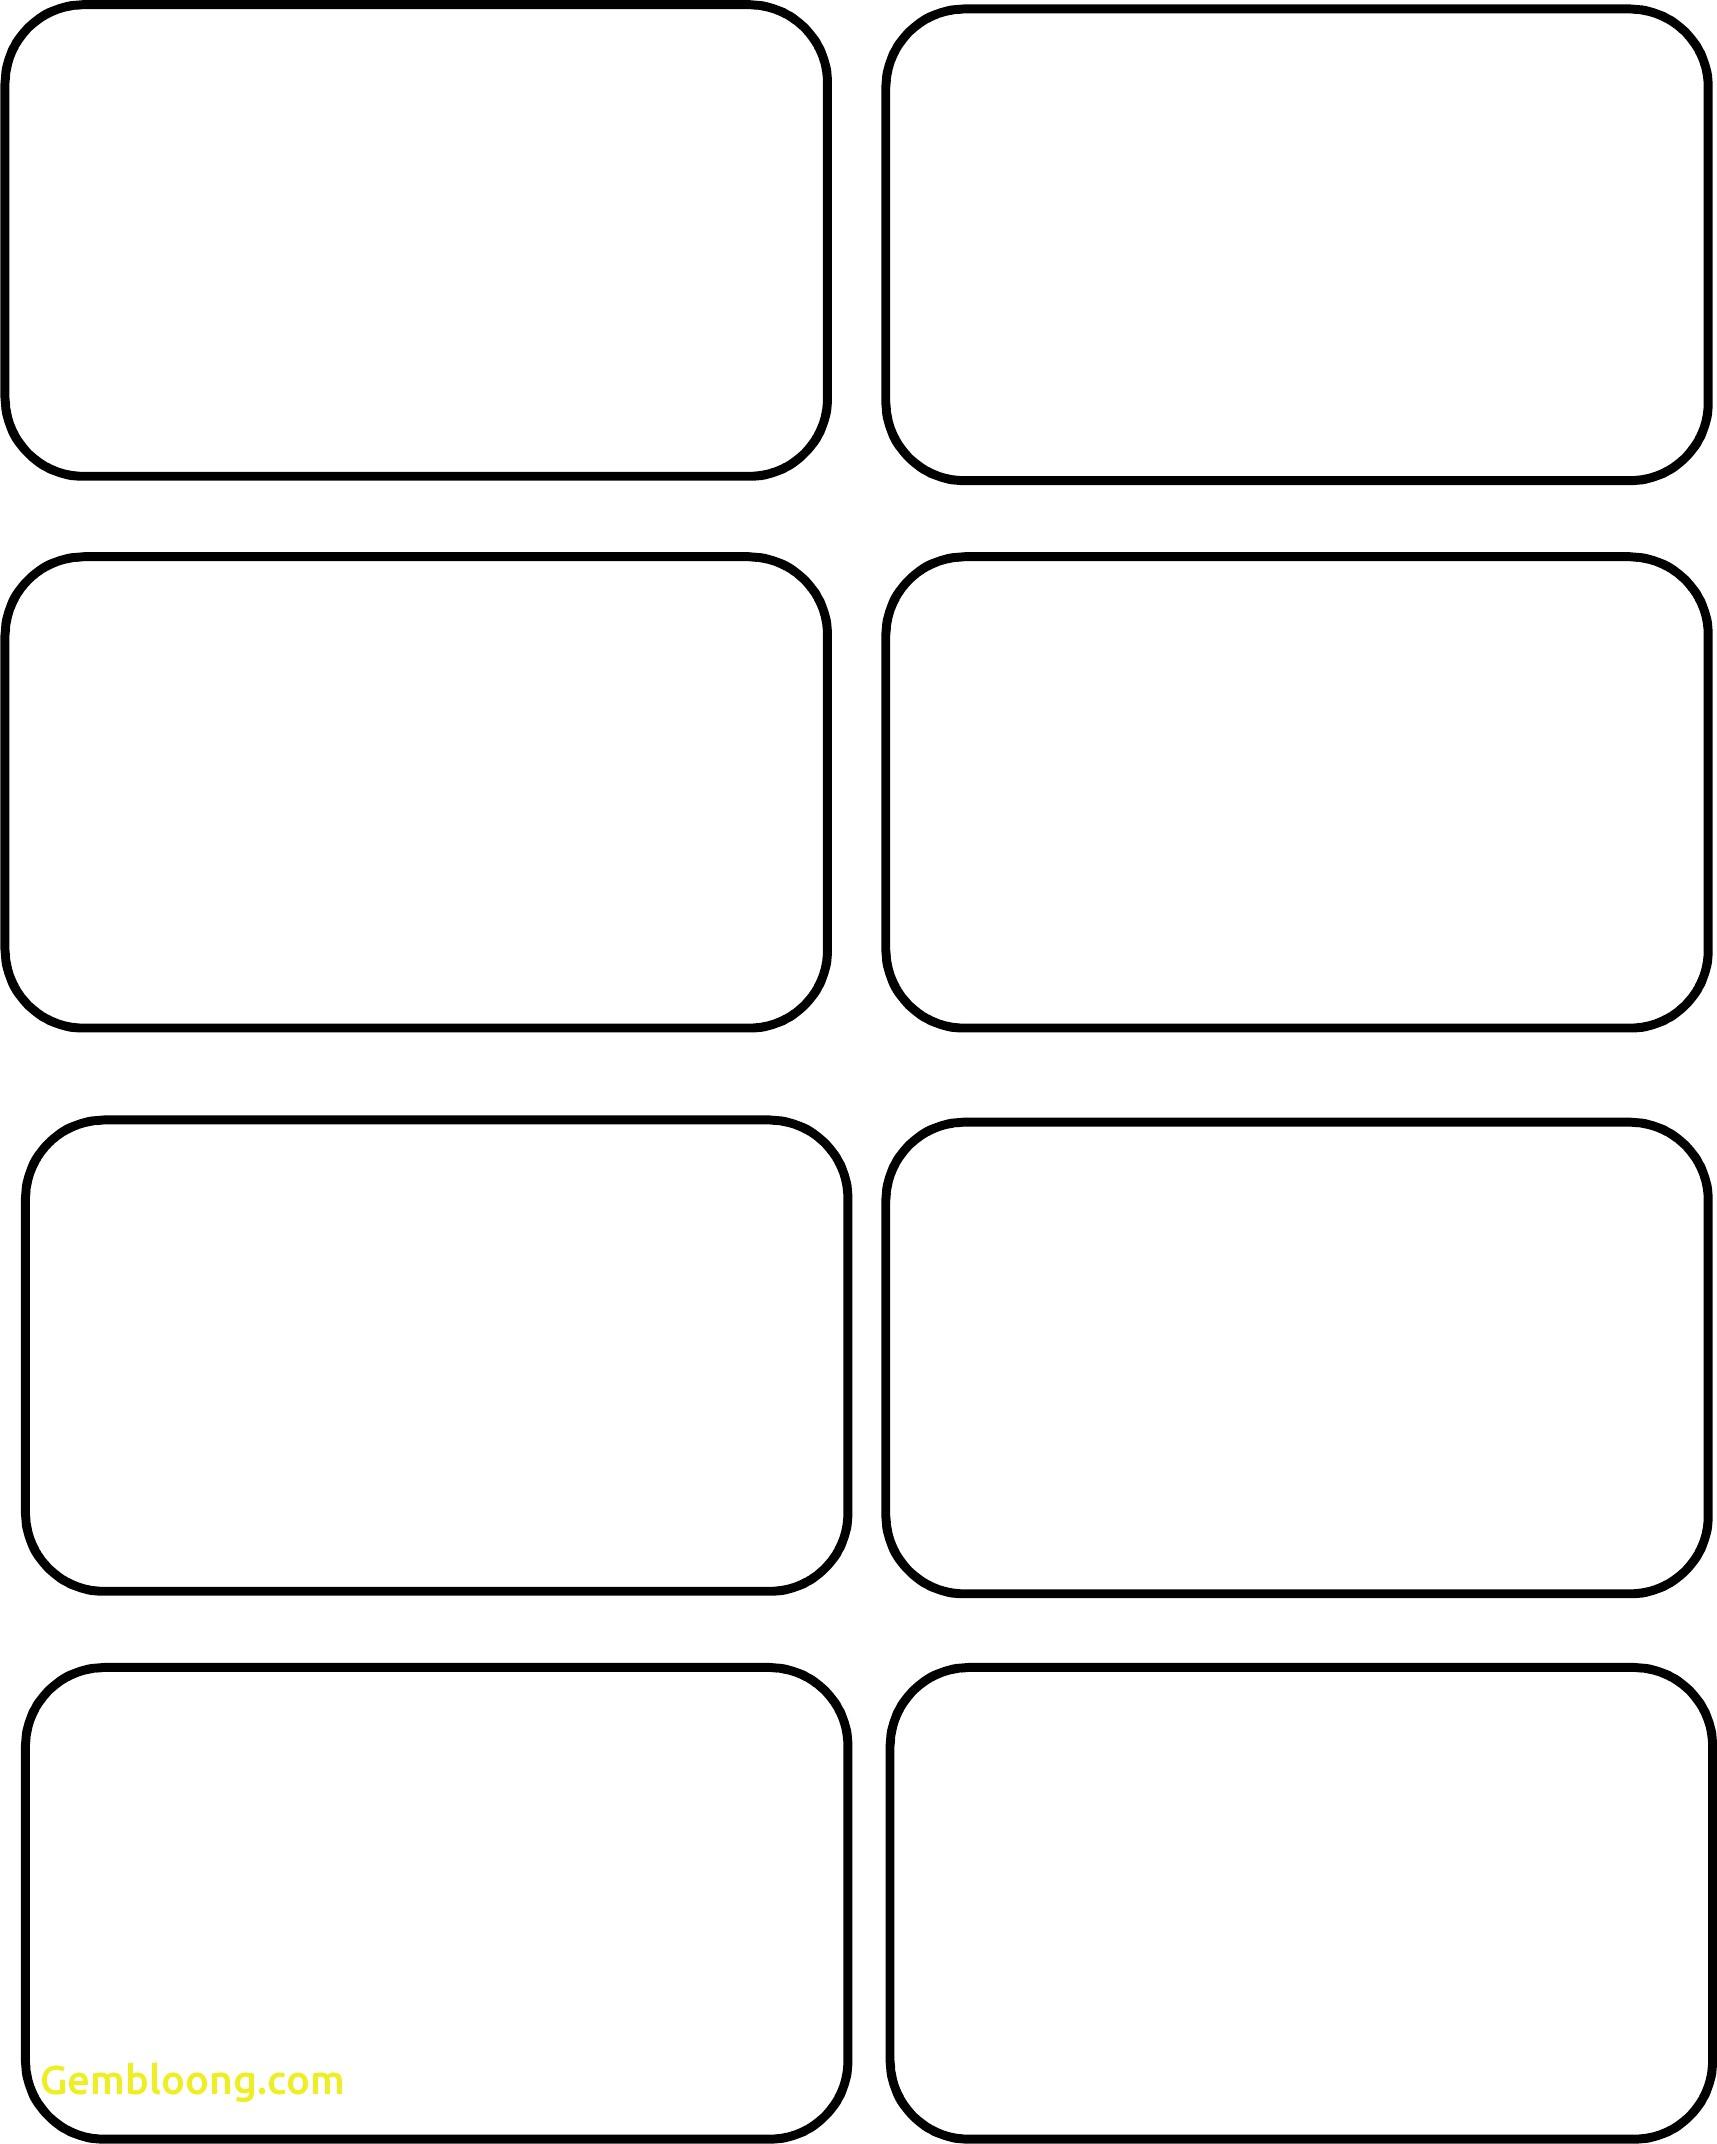 New Name Labels Templates Free - Tim-Lange - Name Tag Template Free Printable